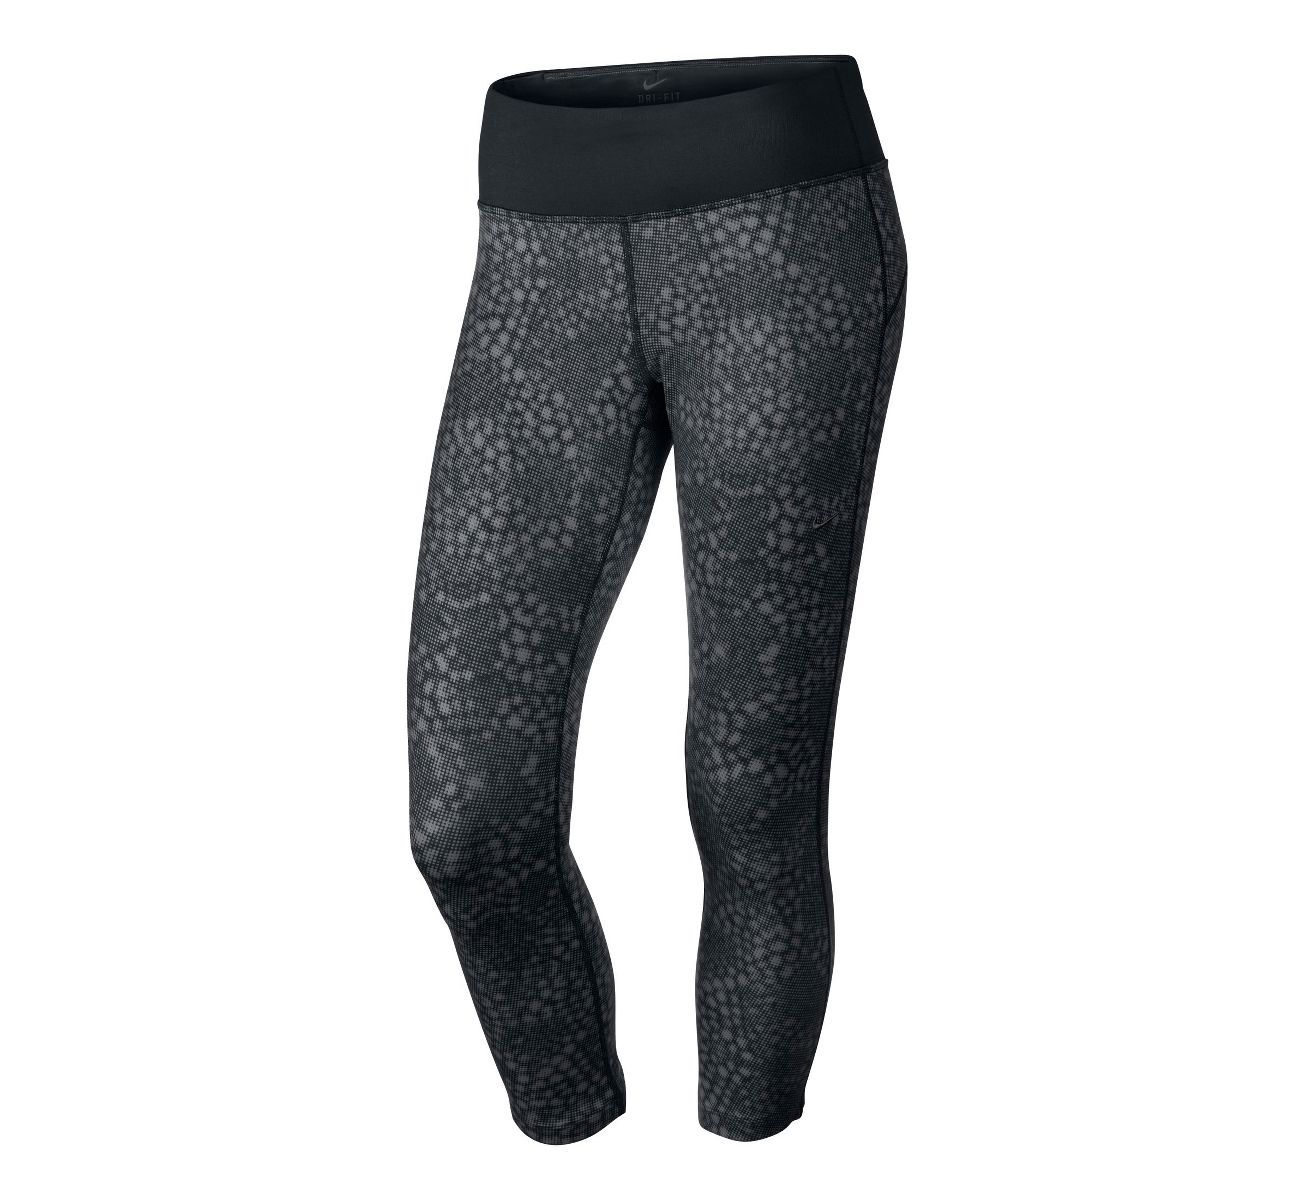 Womens Nike Epic Run Printed Crop Capri Tights at Road Runner Sports